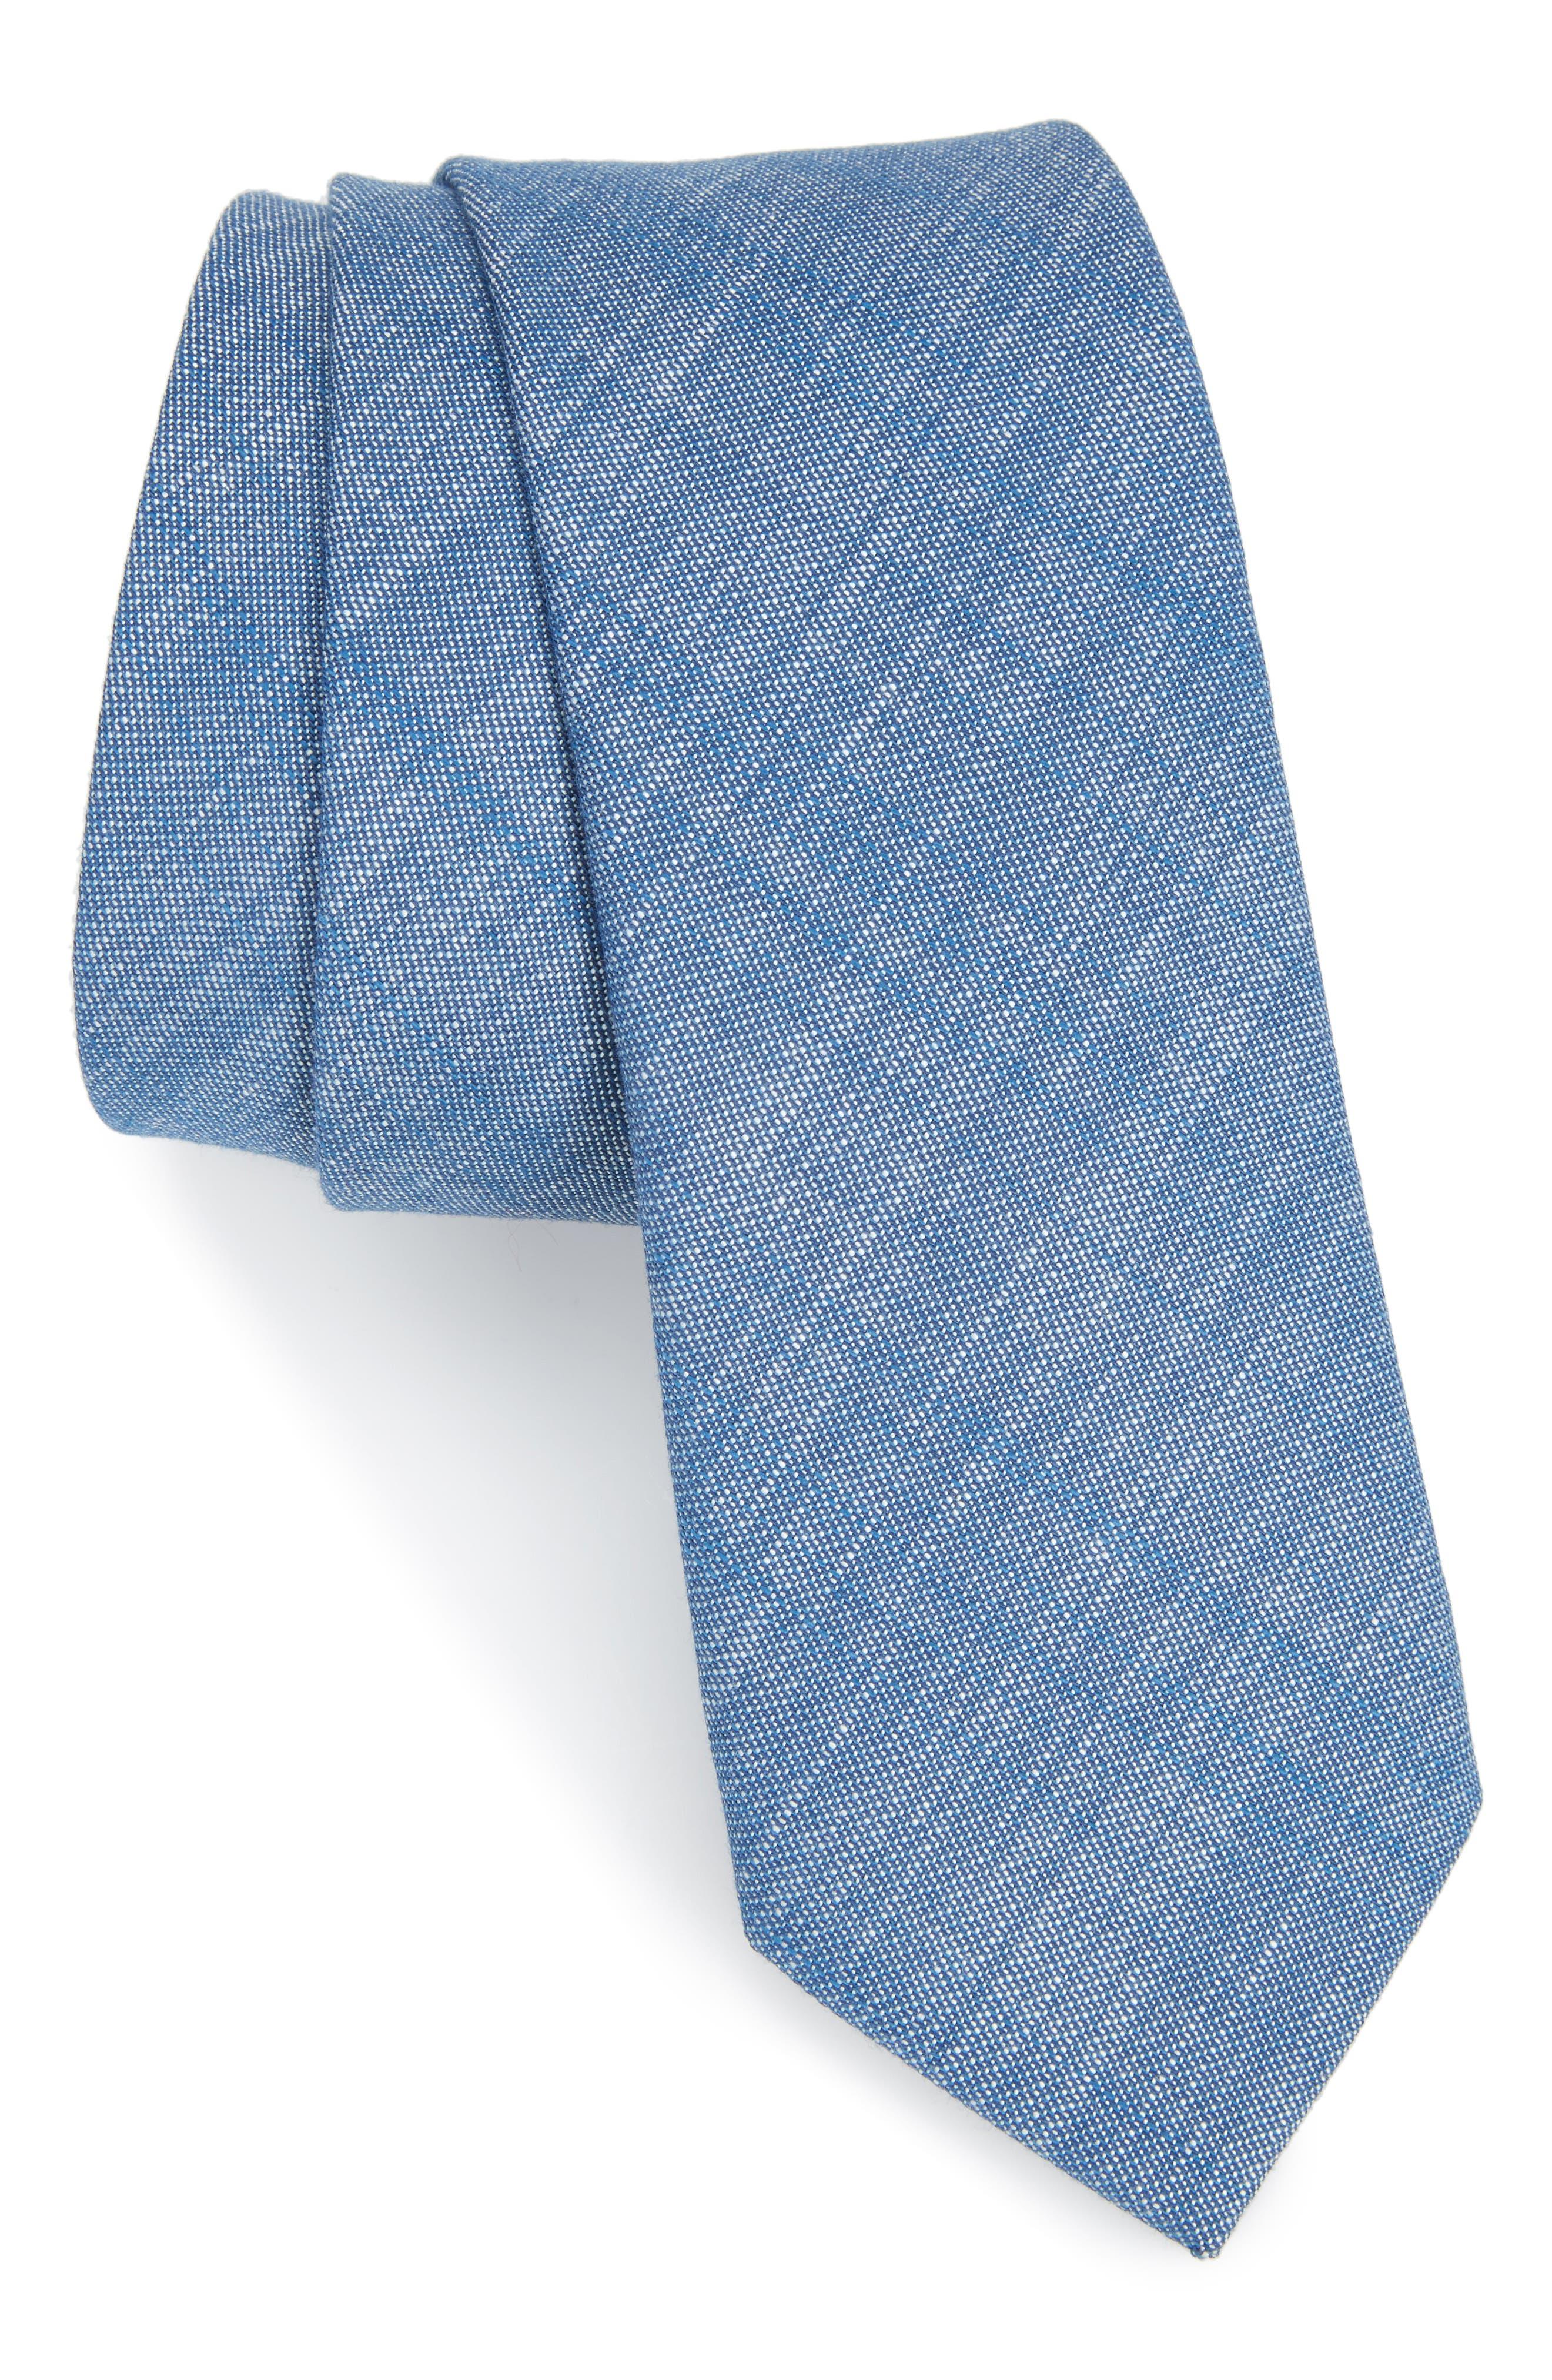 Alternate Image 1 Selected - Nordstrom Men's Shop Tyler Solid Cotton Skinny Tie